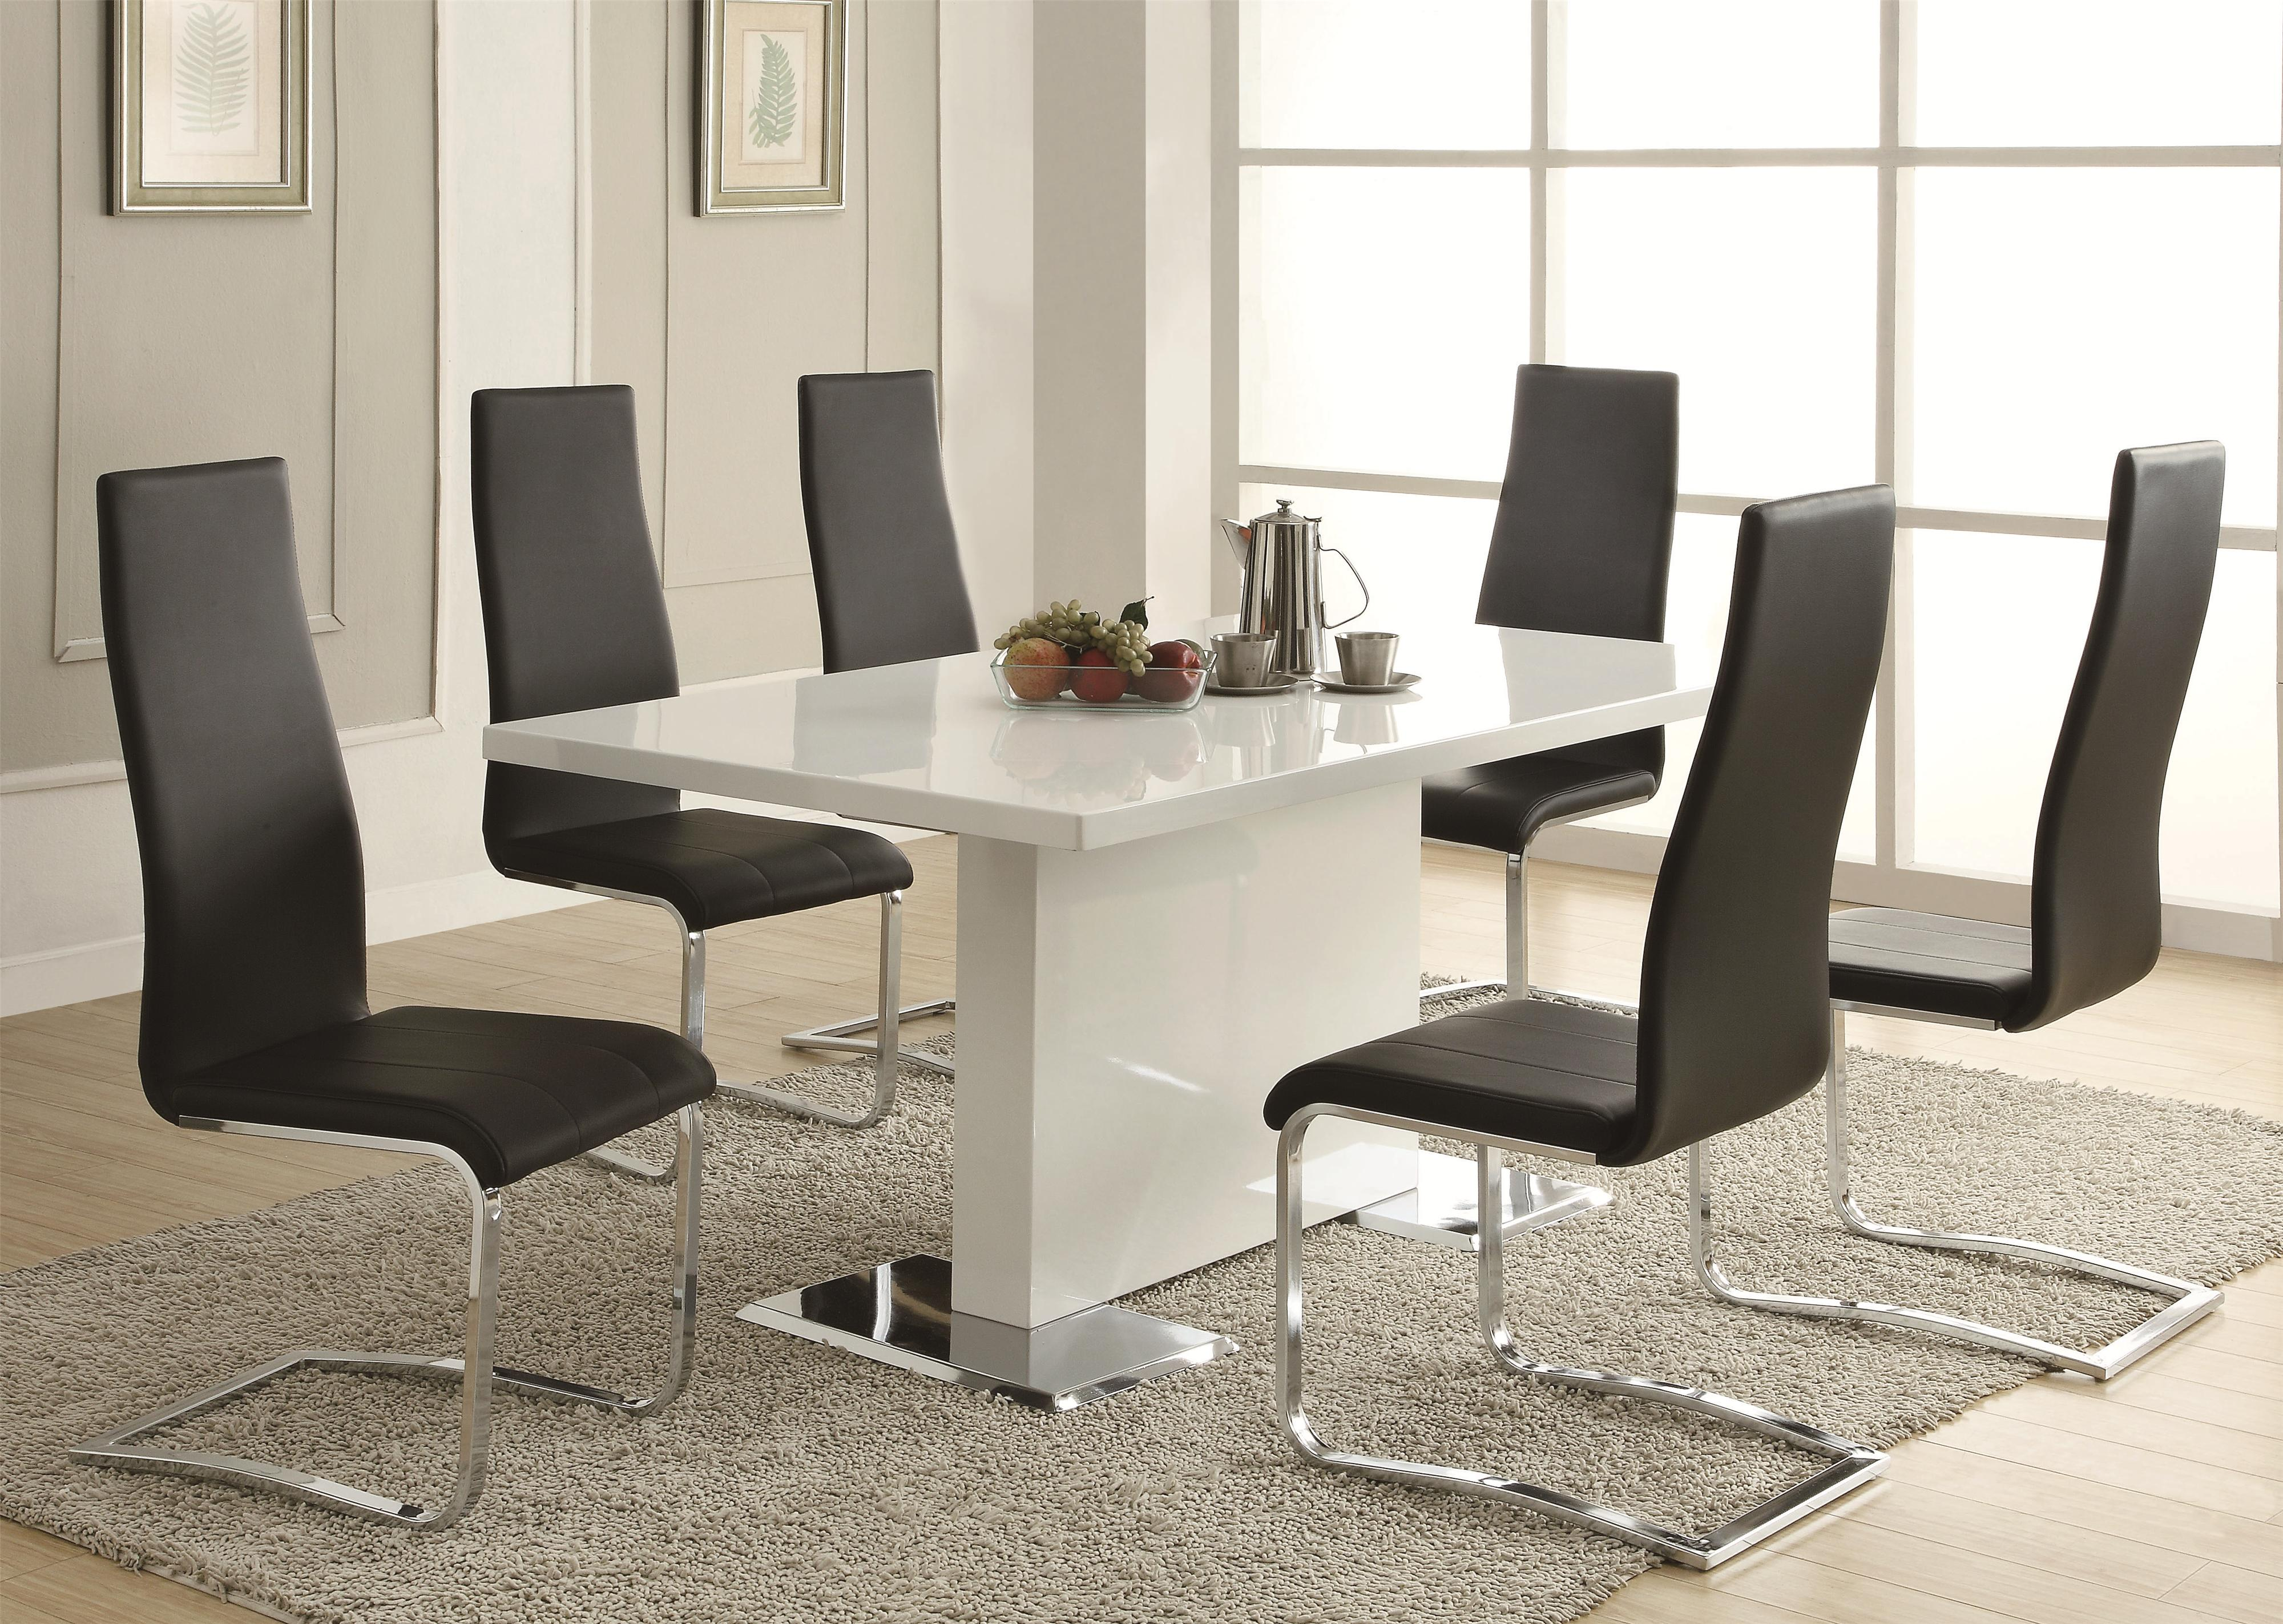 Cozy Coaster Modern Dining 7 Piece White Table u0026 White Upholstered Chairs Set - modern dining table sets